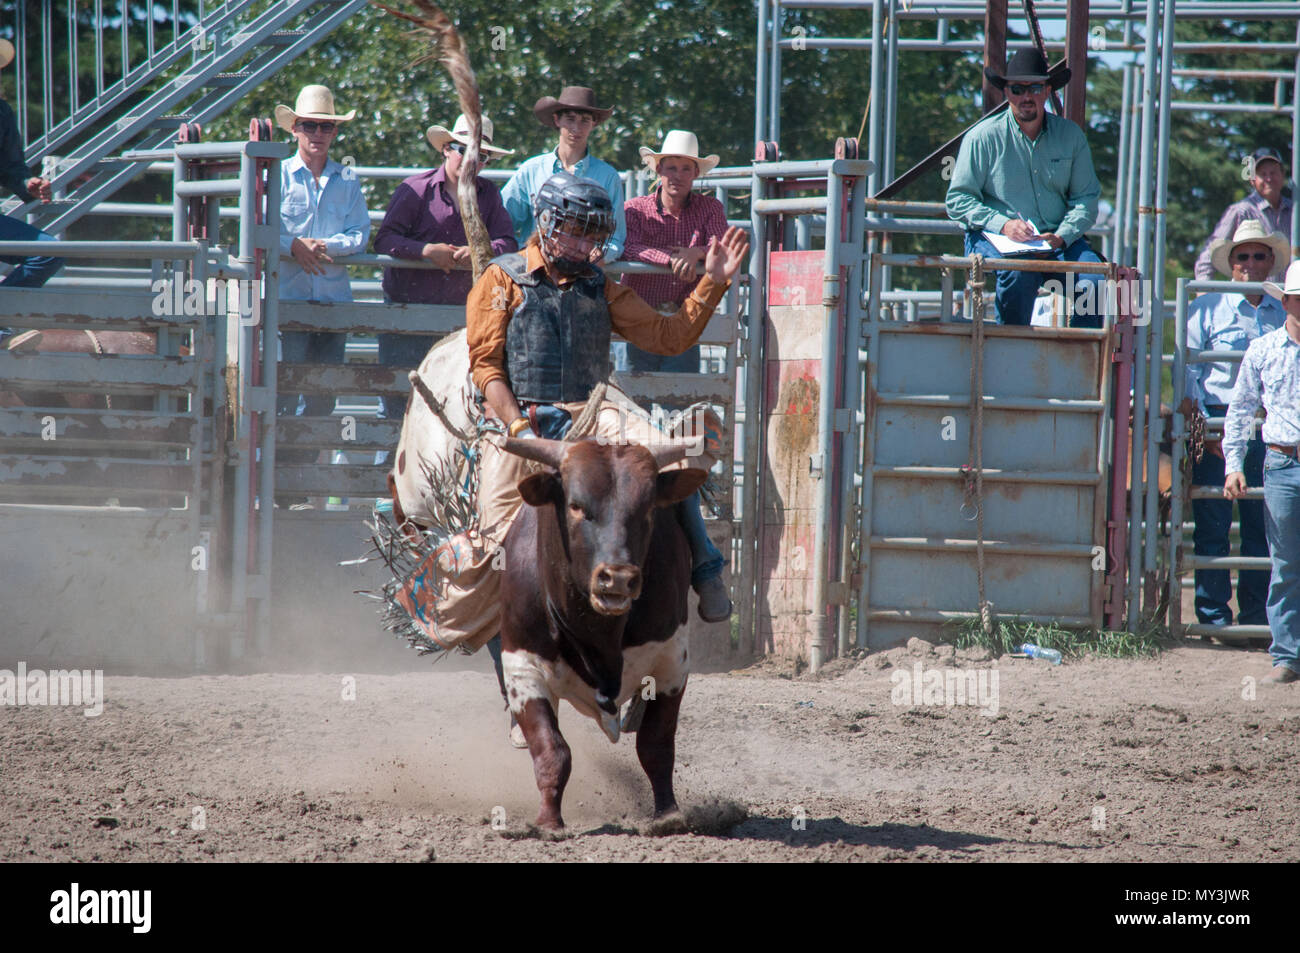 Bull Rider Rodeo Stock Photos Amp Bull Rider Rodeo Stock